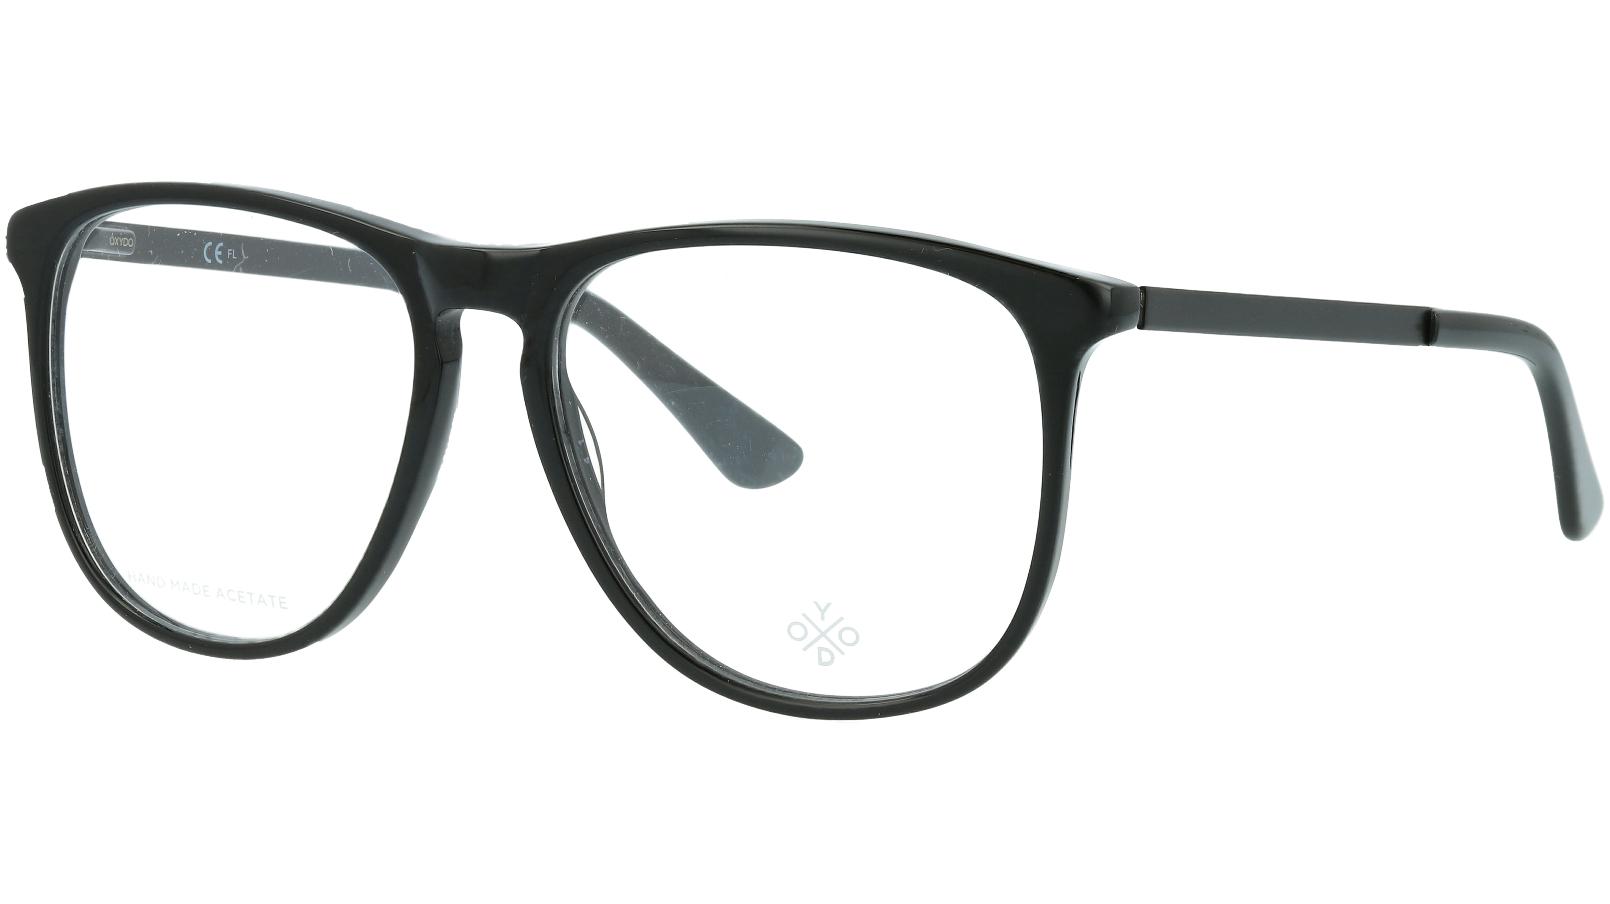 OXYDO OX542 263 55 BLACK Glasses